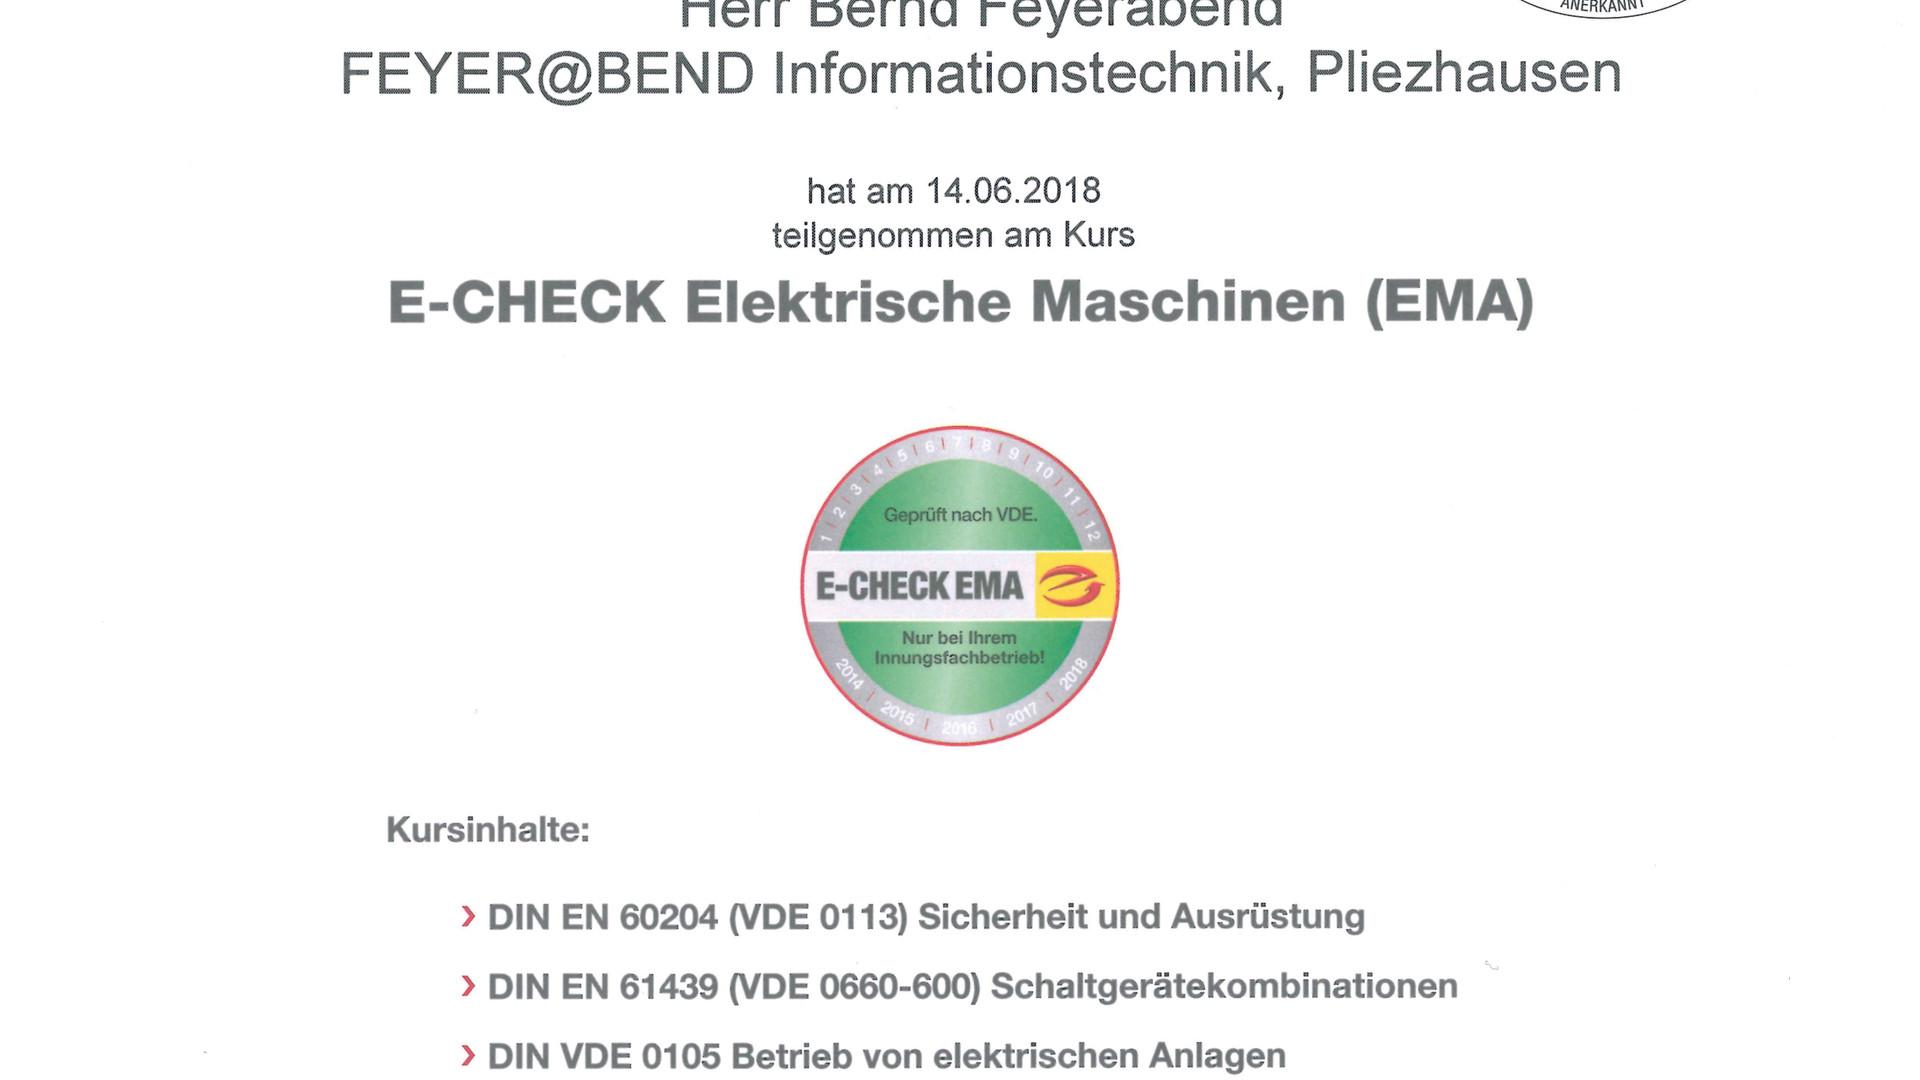 E-Check Elektrische Maschinen.jpg